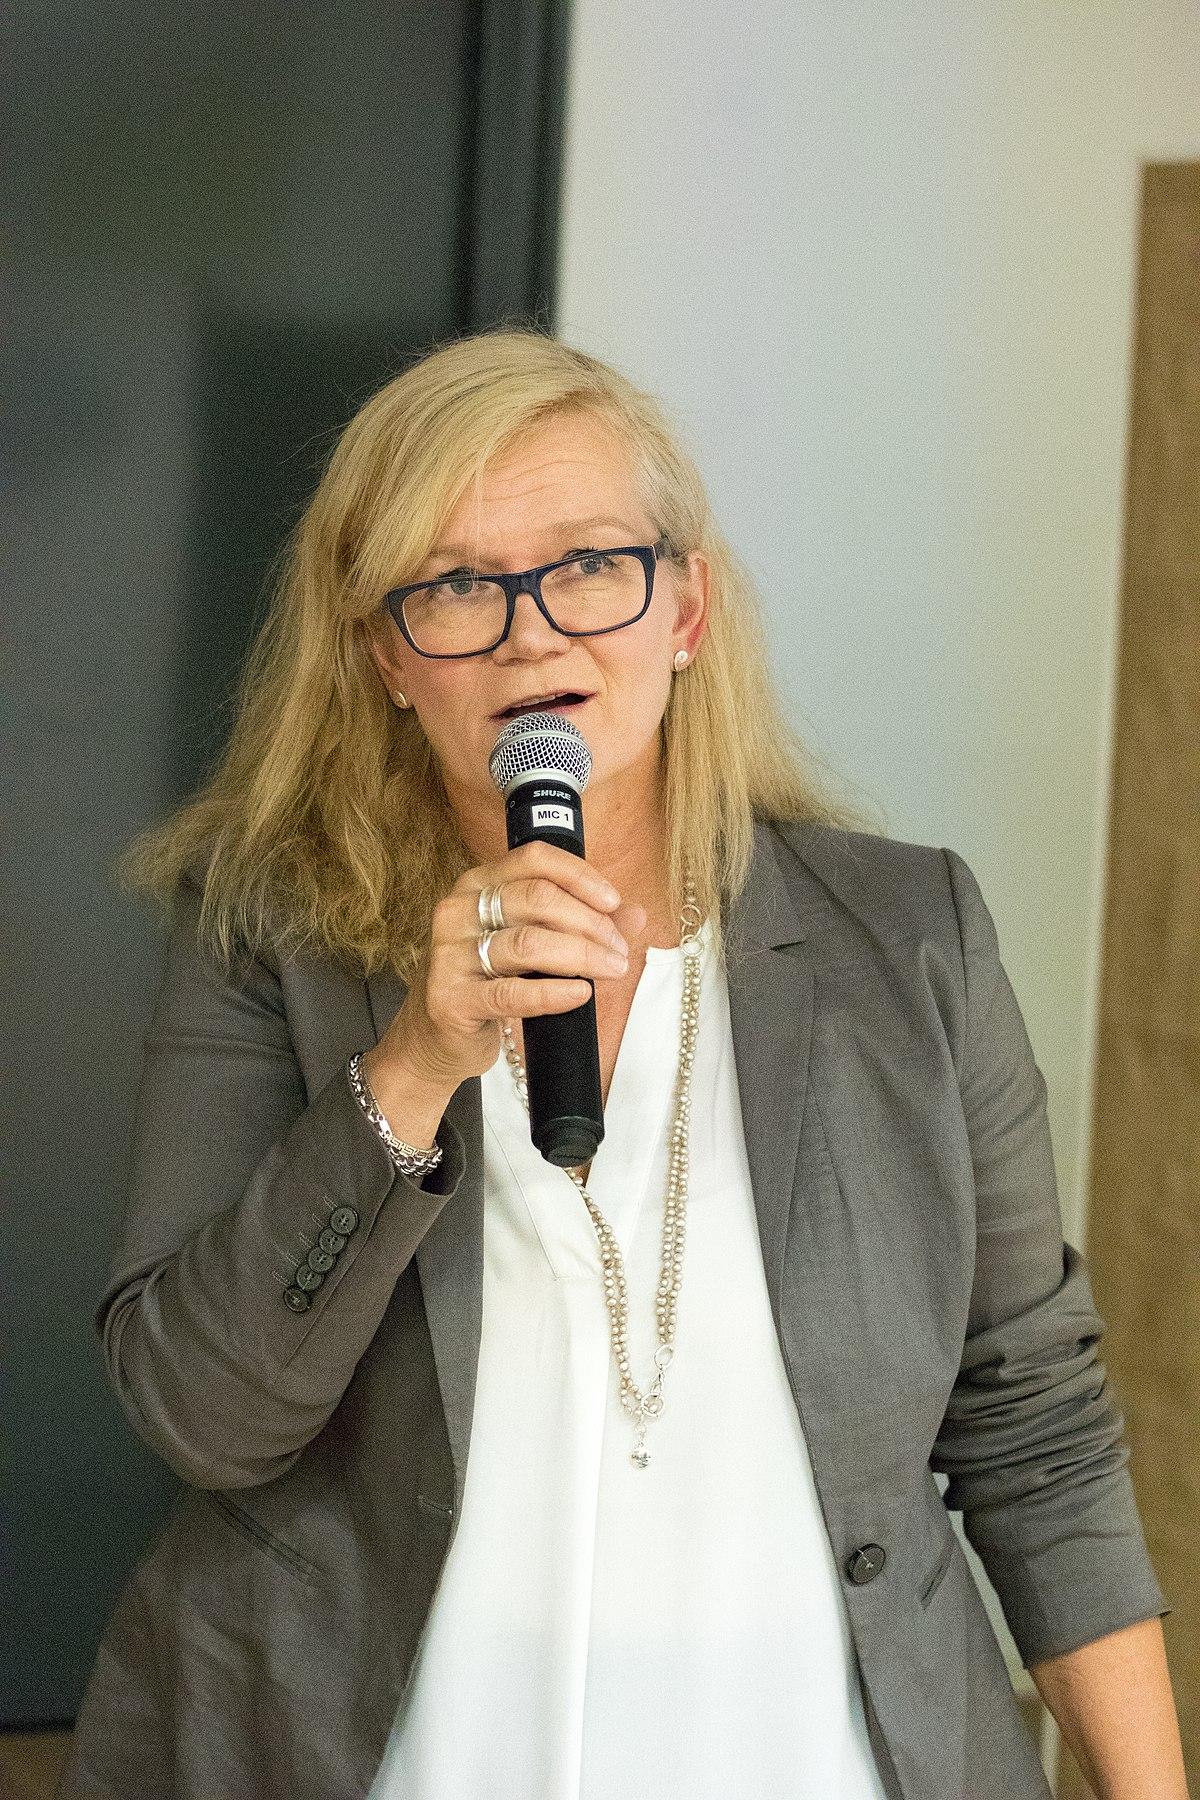 Anne Flinkkilä